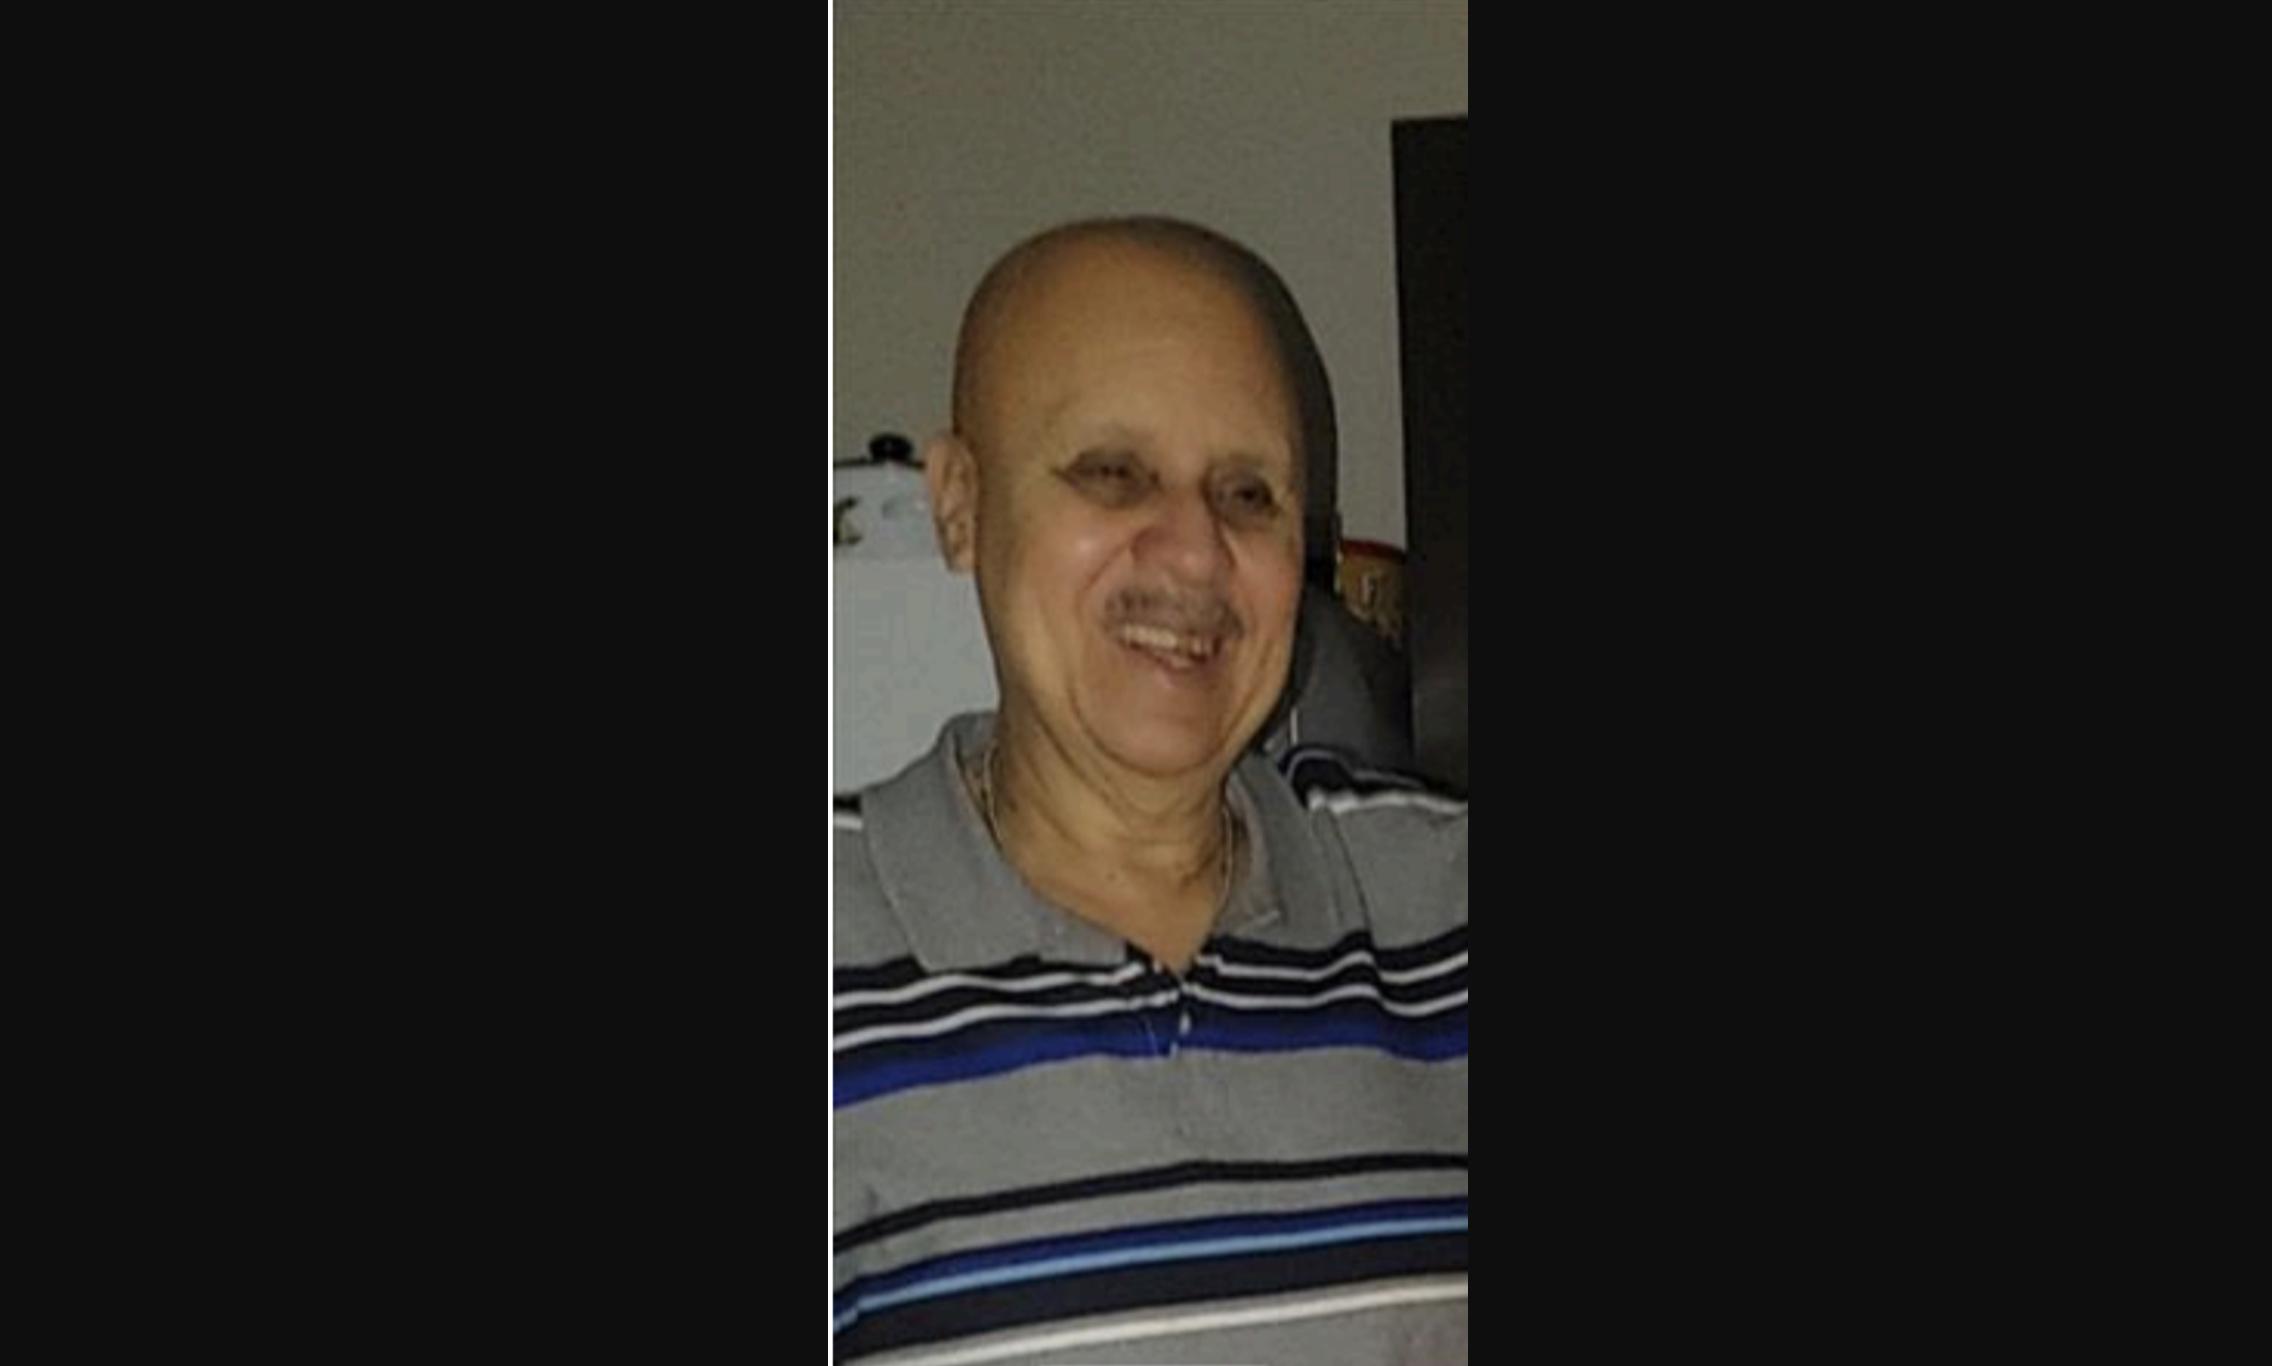 Victor Roldan, 64, was reported missing April 29, 2021.